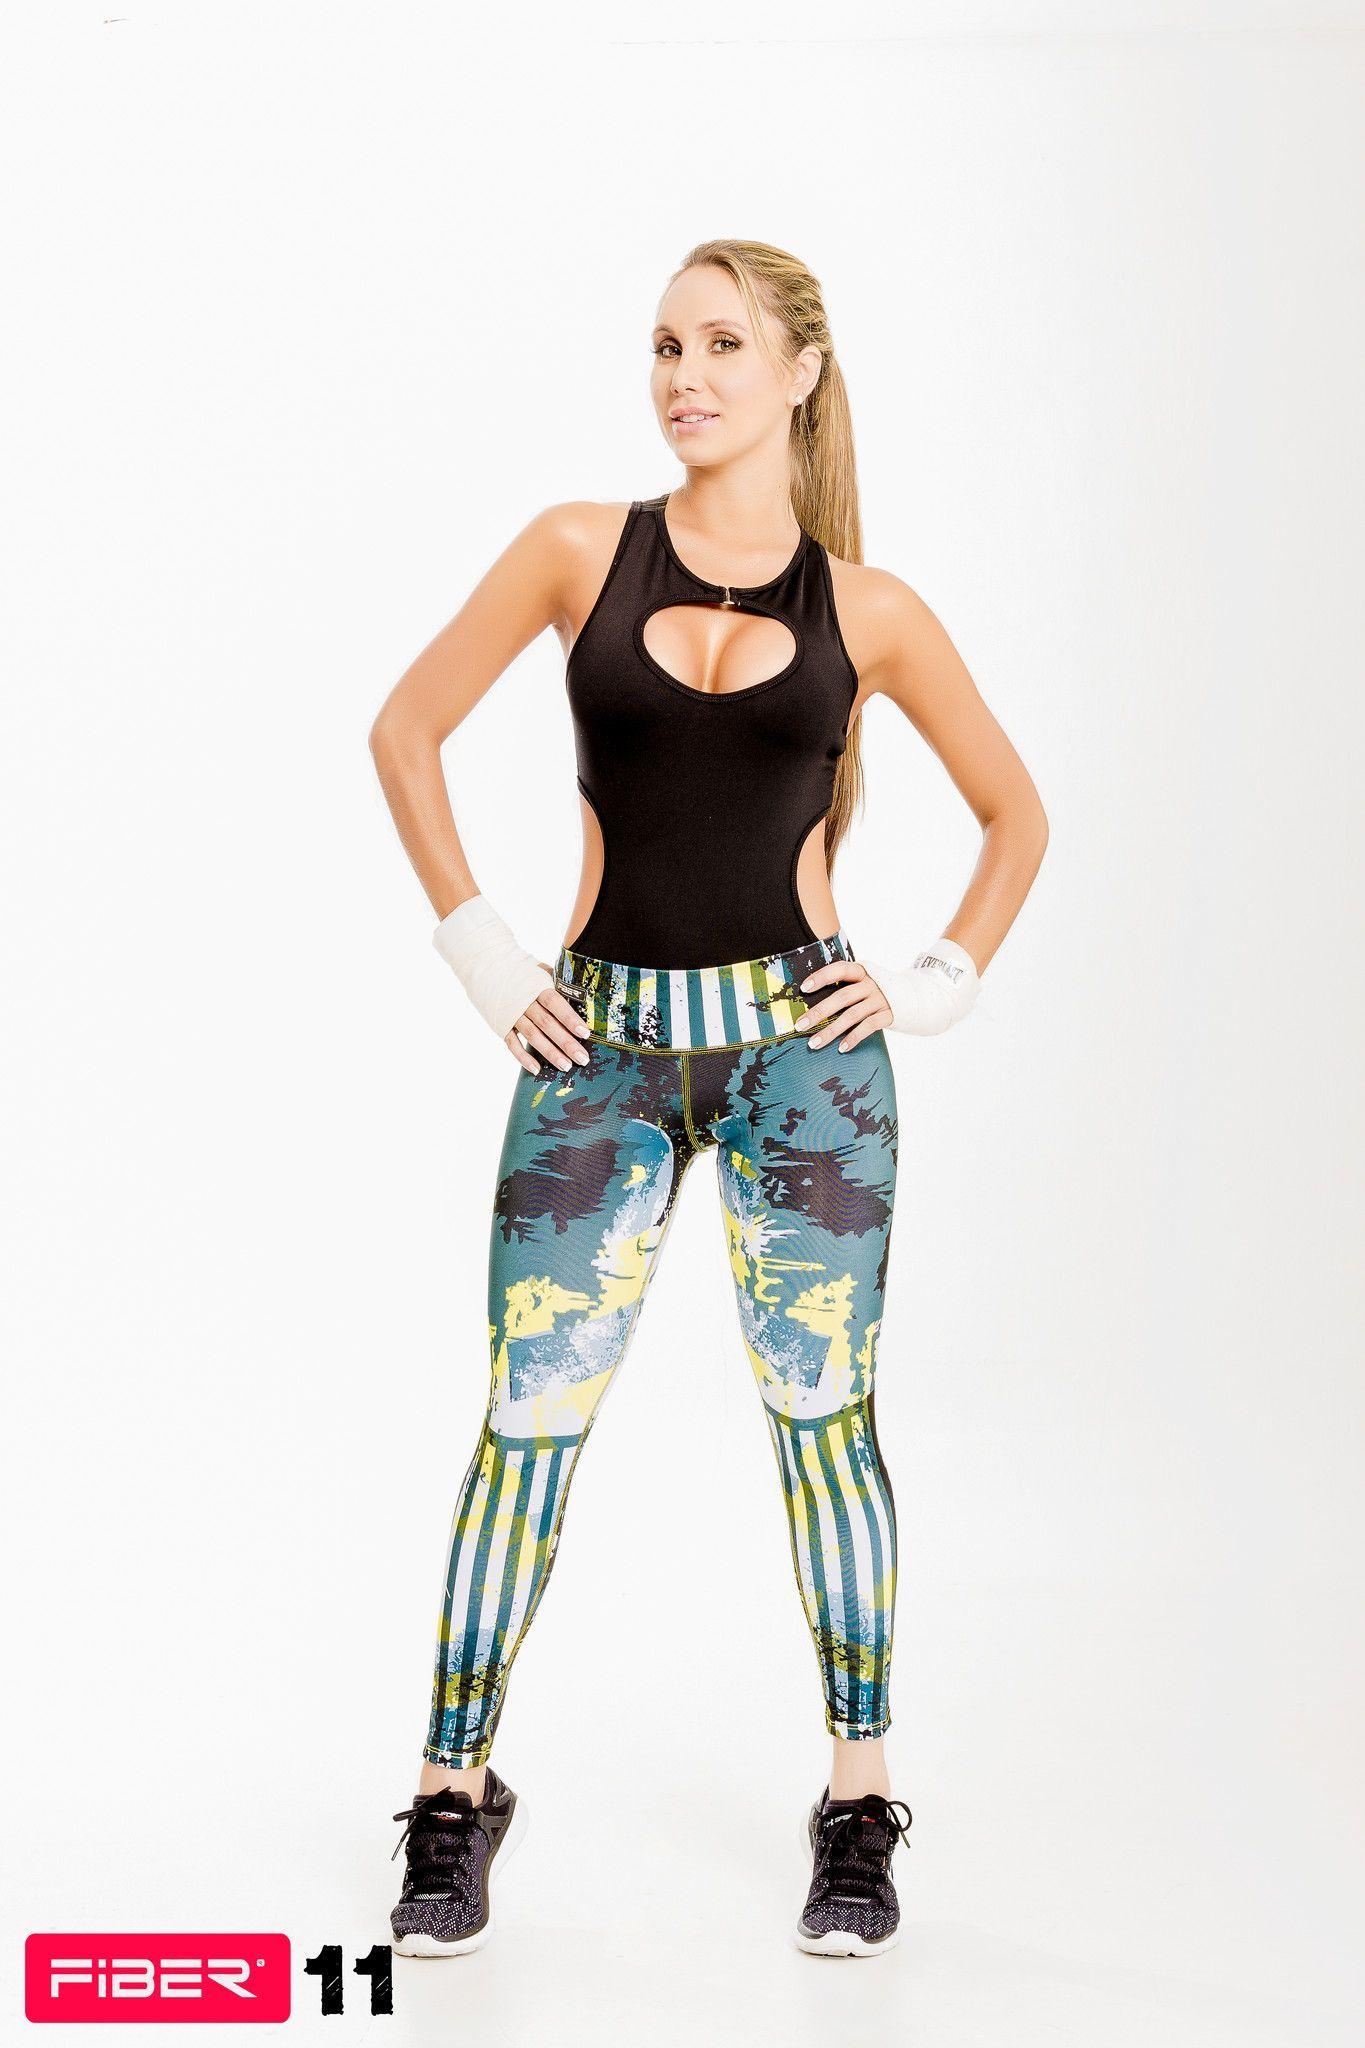 d97b3cddd4030 Colombian Workout Pants Body Shape Leggings Pilates Cross fit Fitness FIBER  11